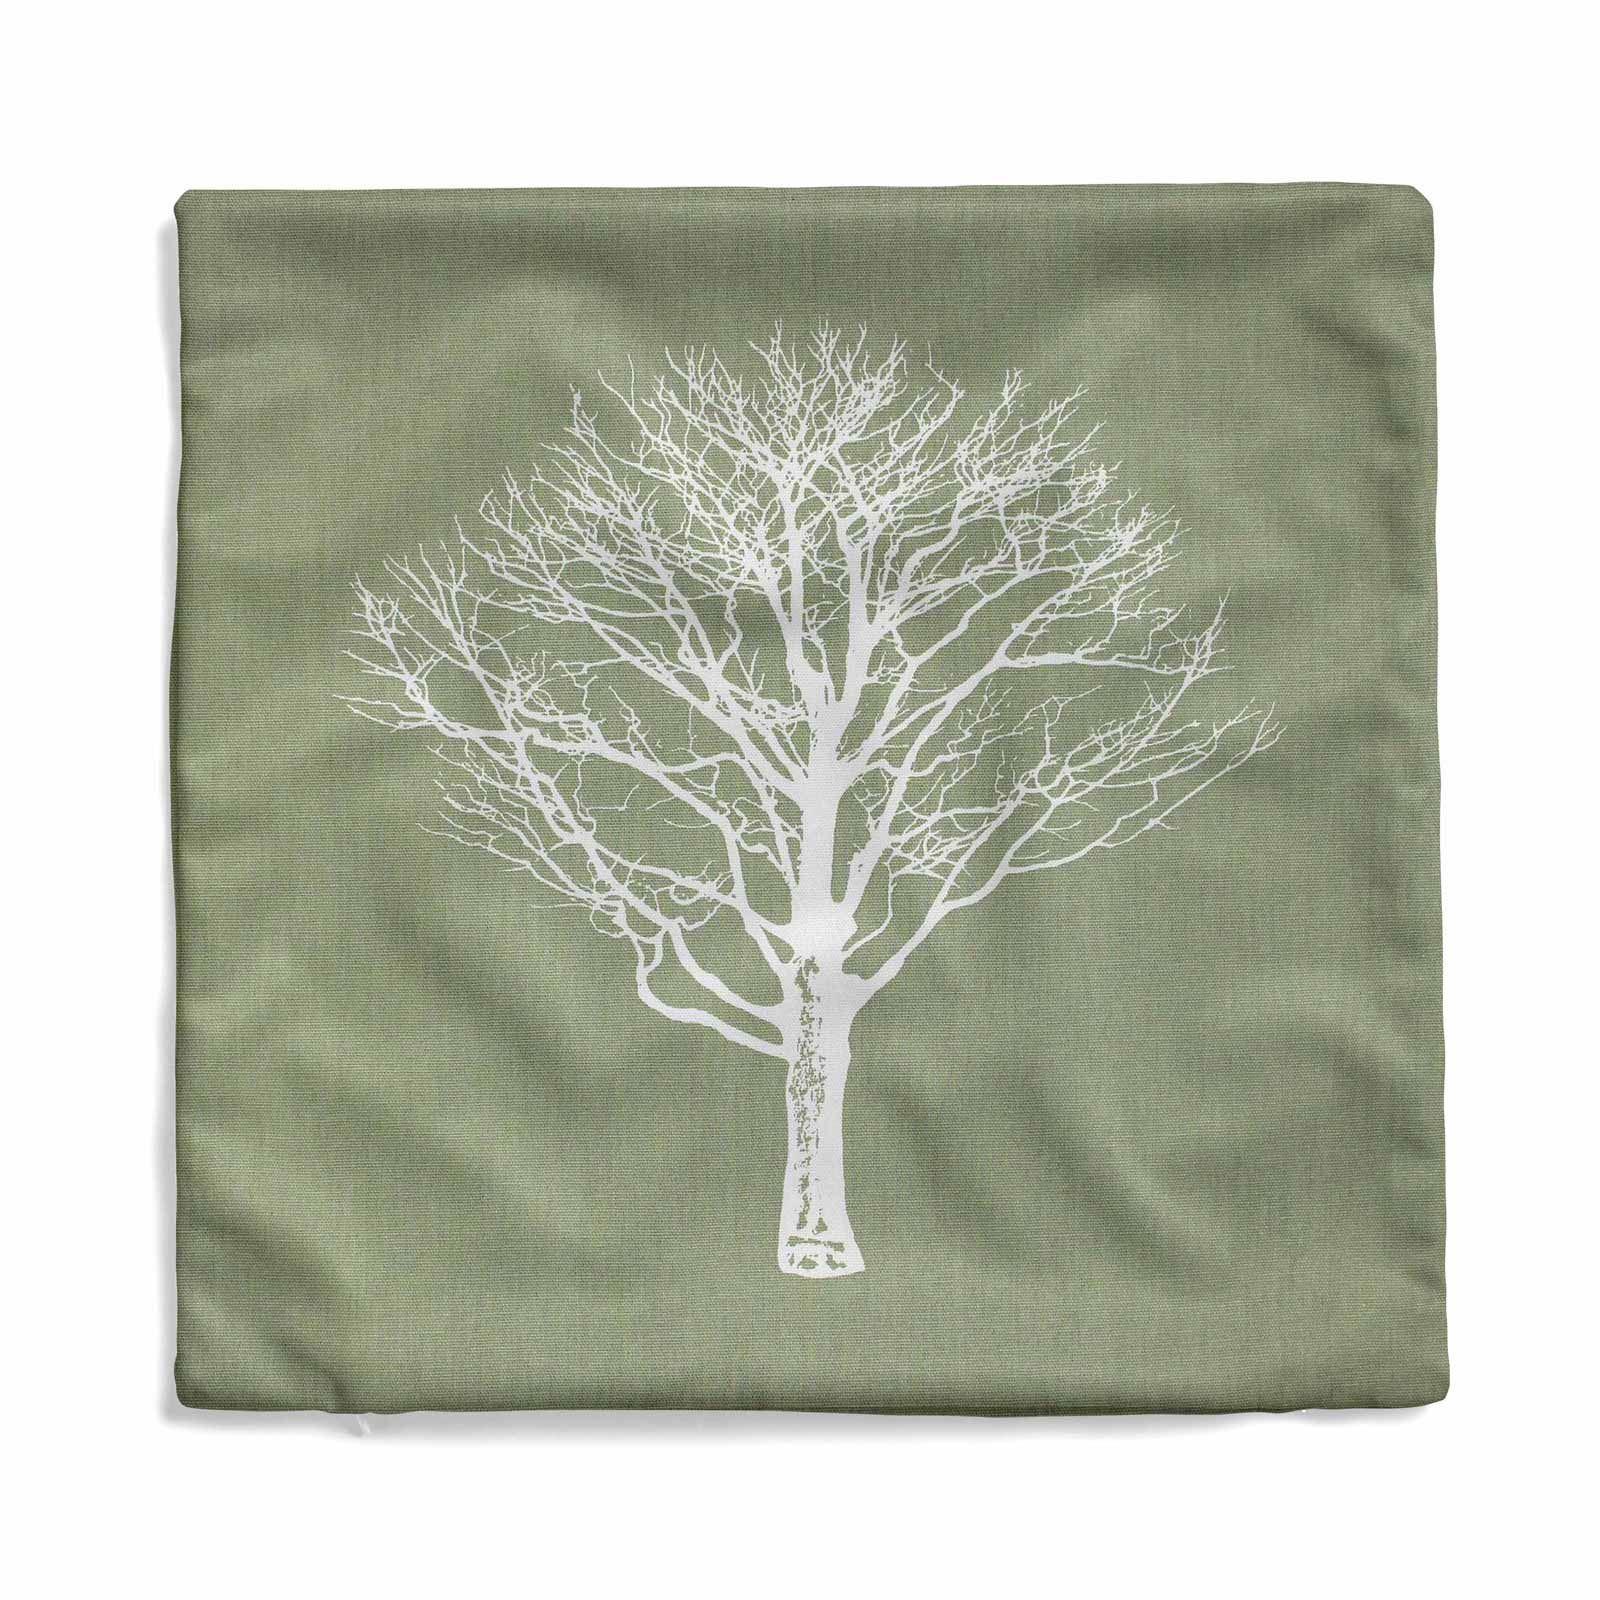 Woodland-Trees-Cushion-Cover-Modern-Reversible-Tree-Print-Covers-17-034-x-17-034 thumbnail 26